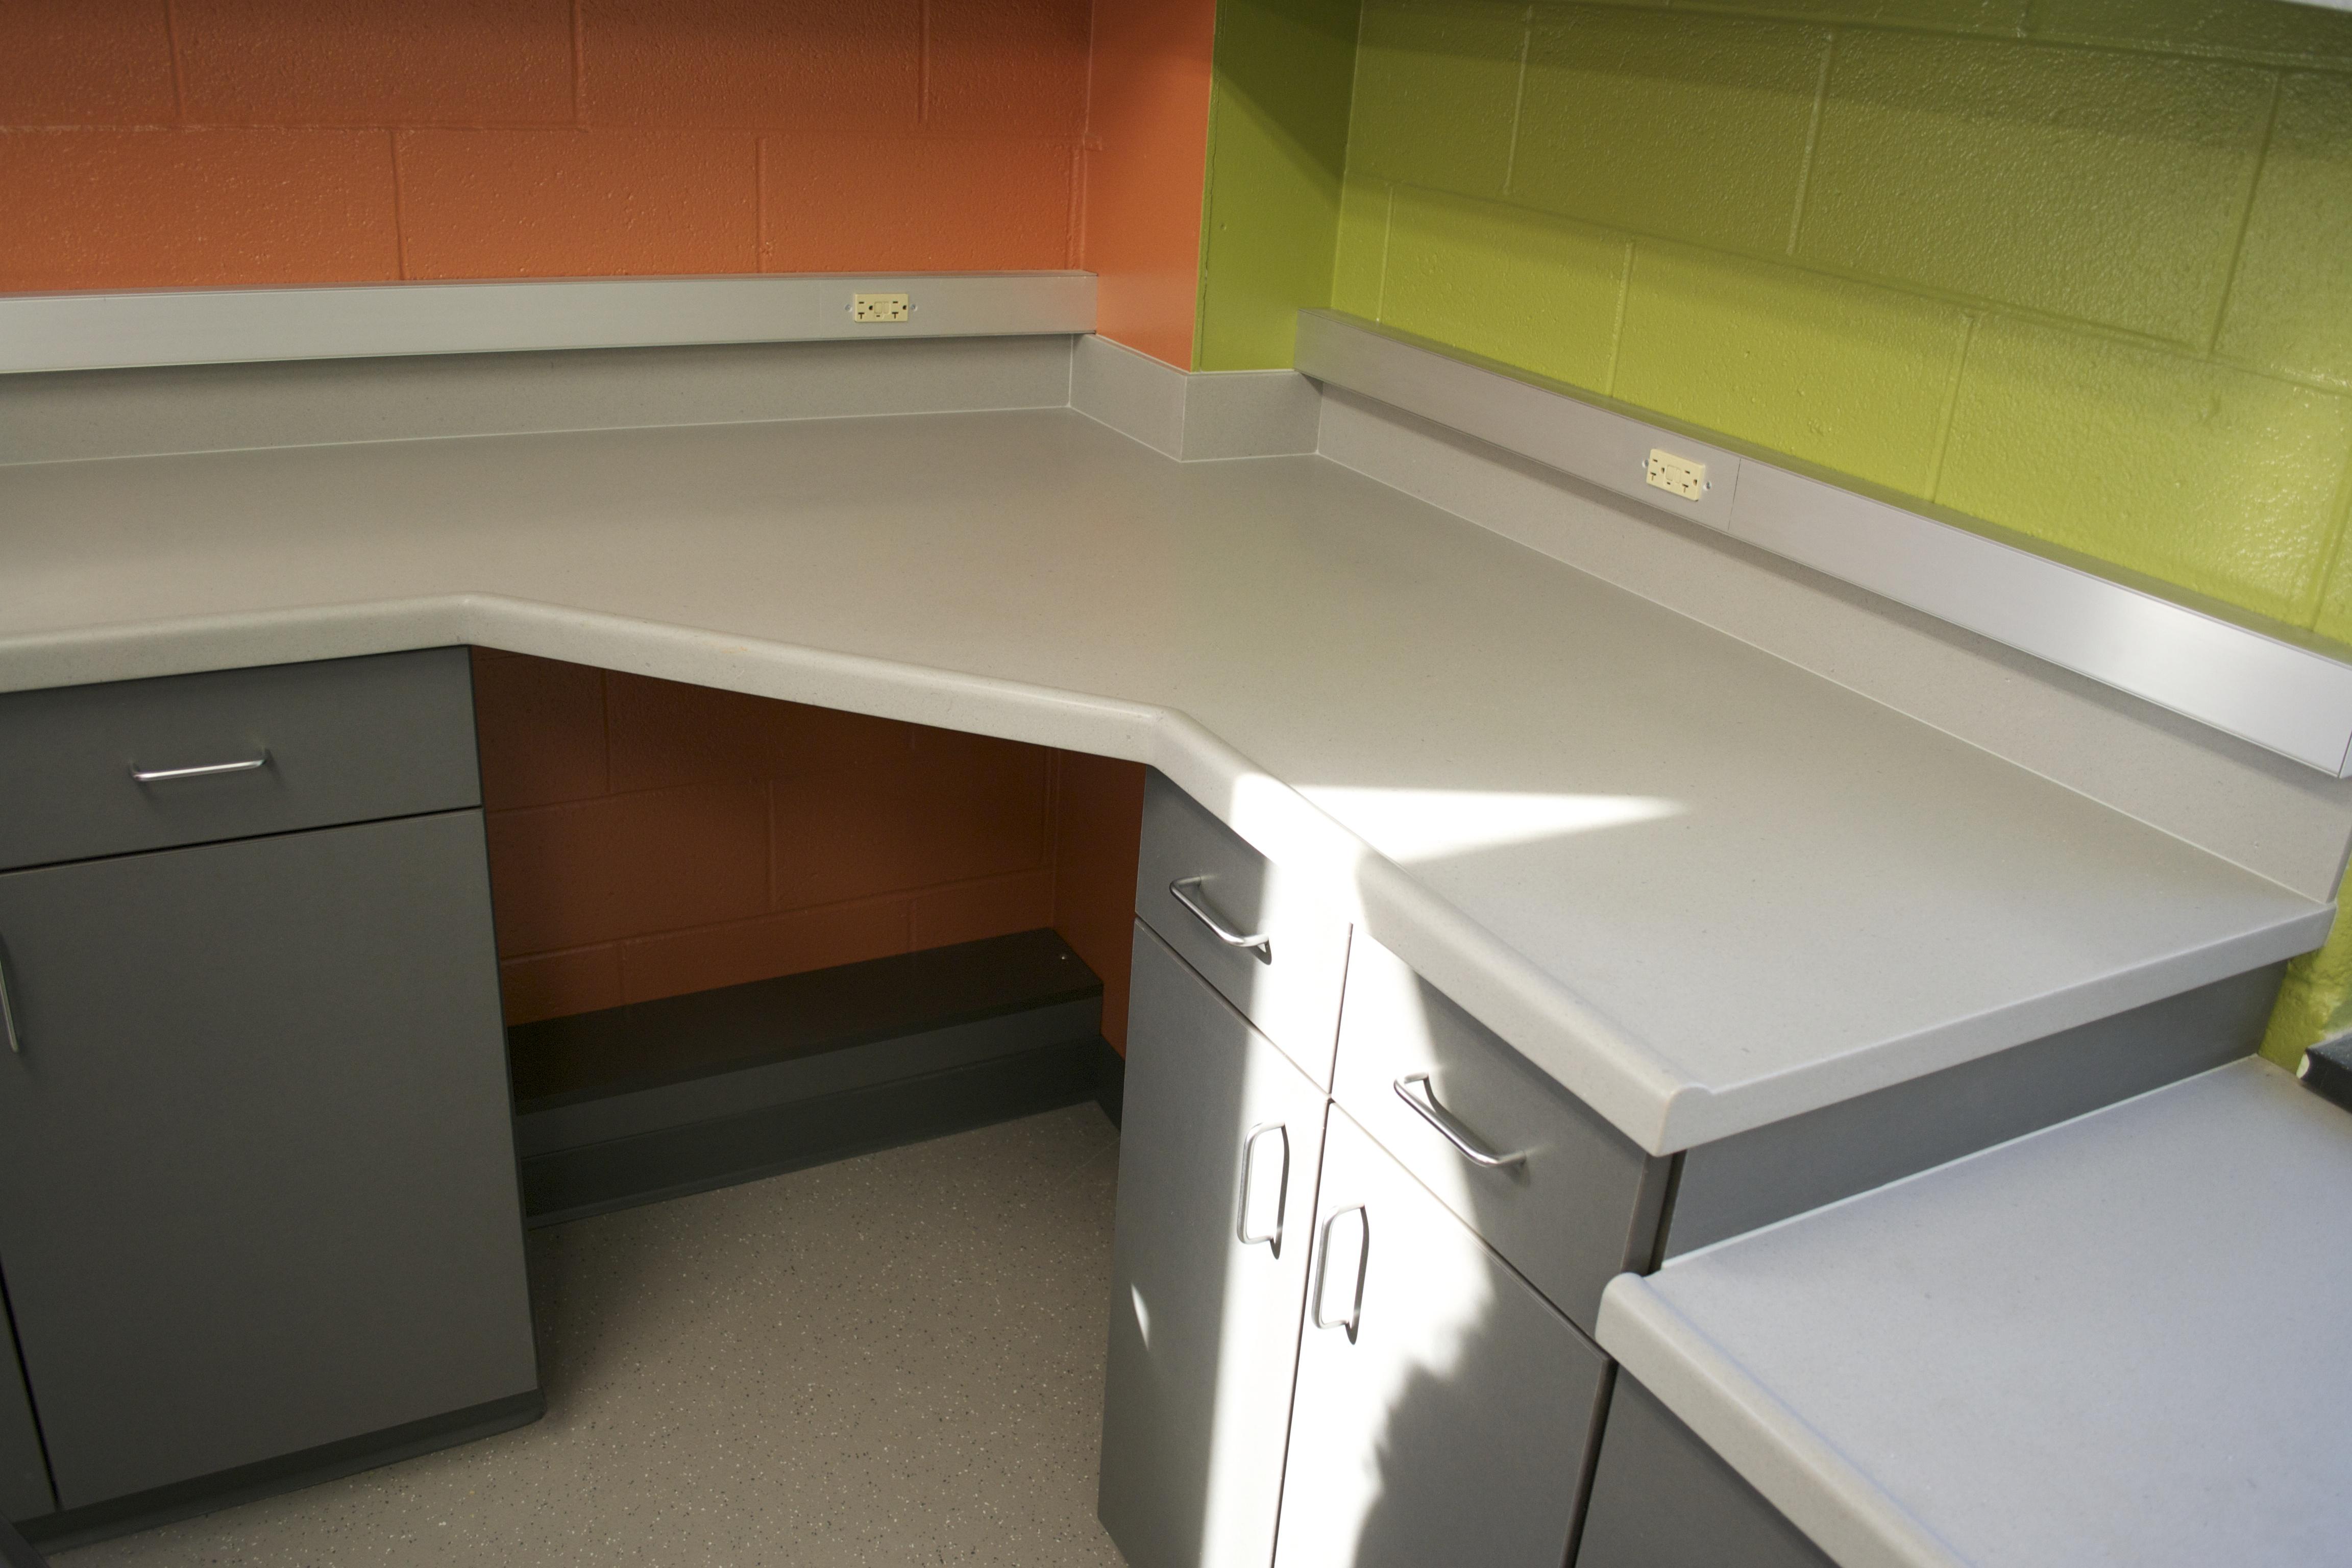 CJ STEMM Lab  Classrooms Project Completed  Vaughn